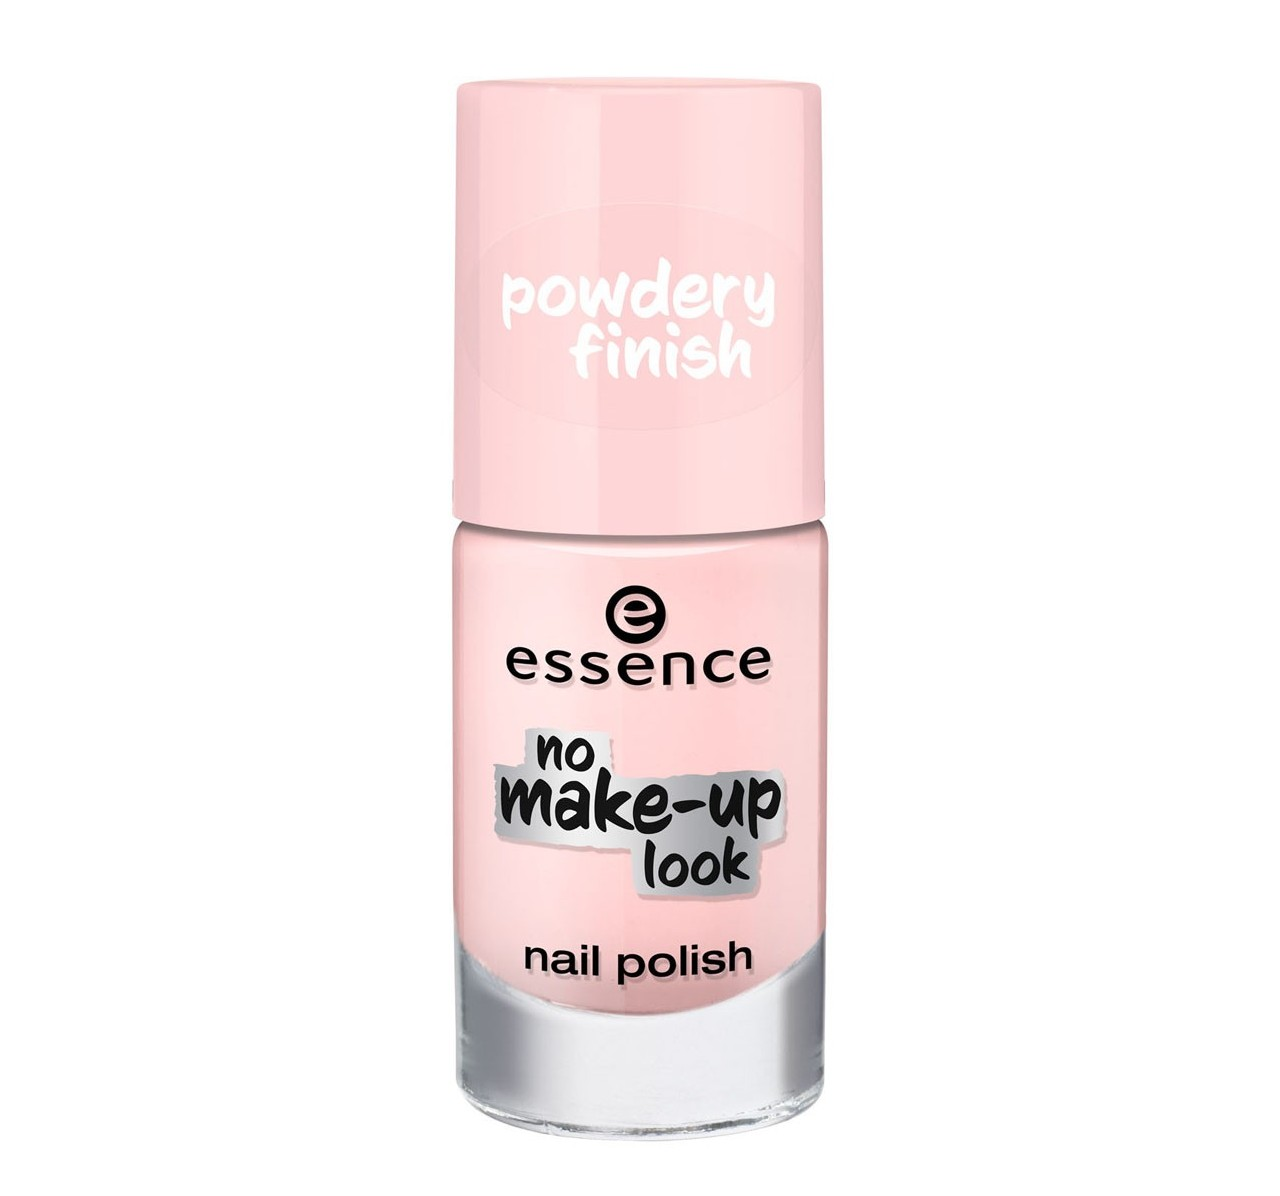 Essence No Make Up Look Nail Polish 01 Powdery Rose 8ml Beauty